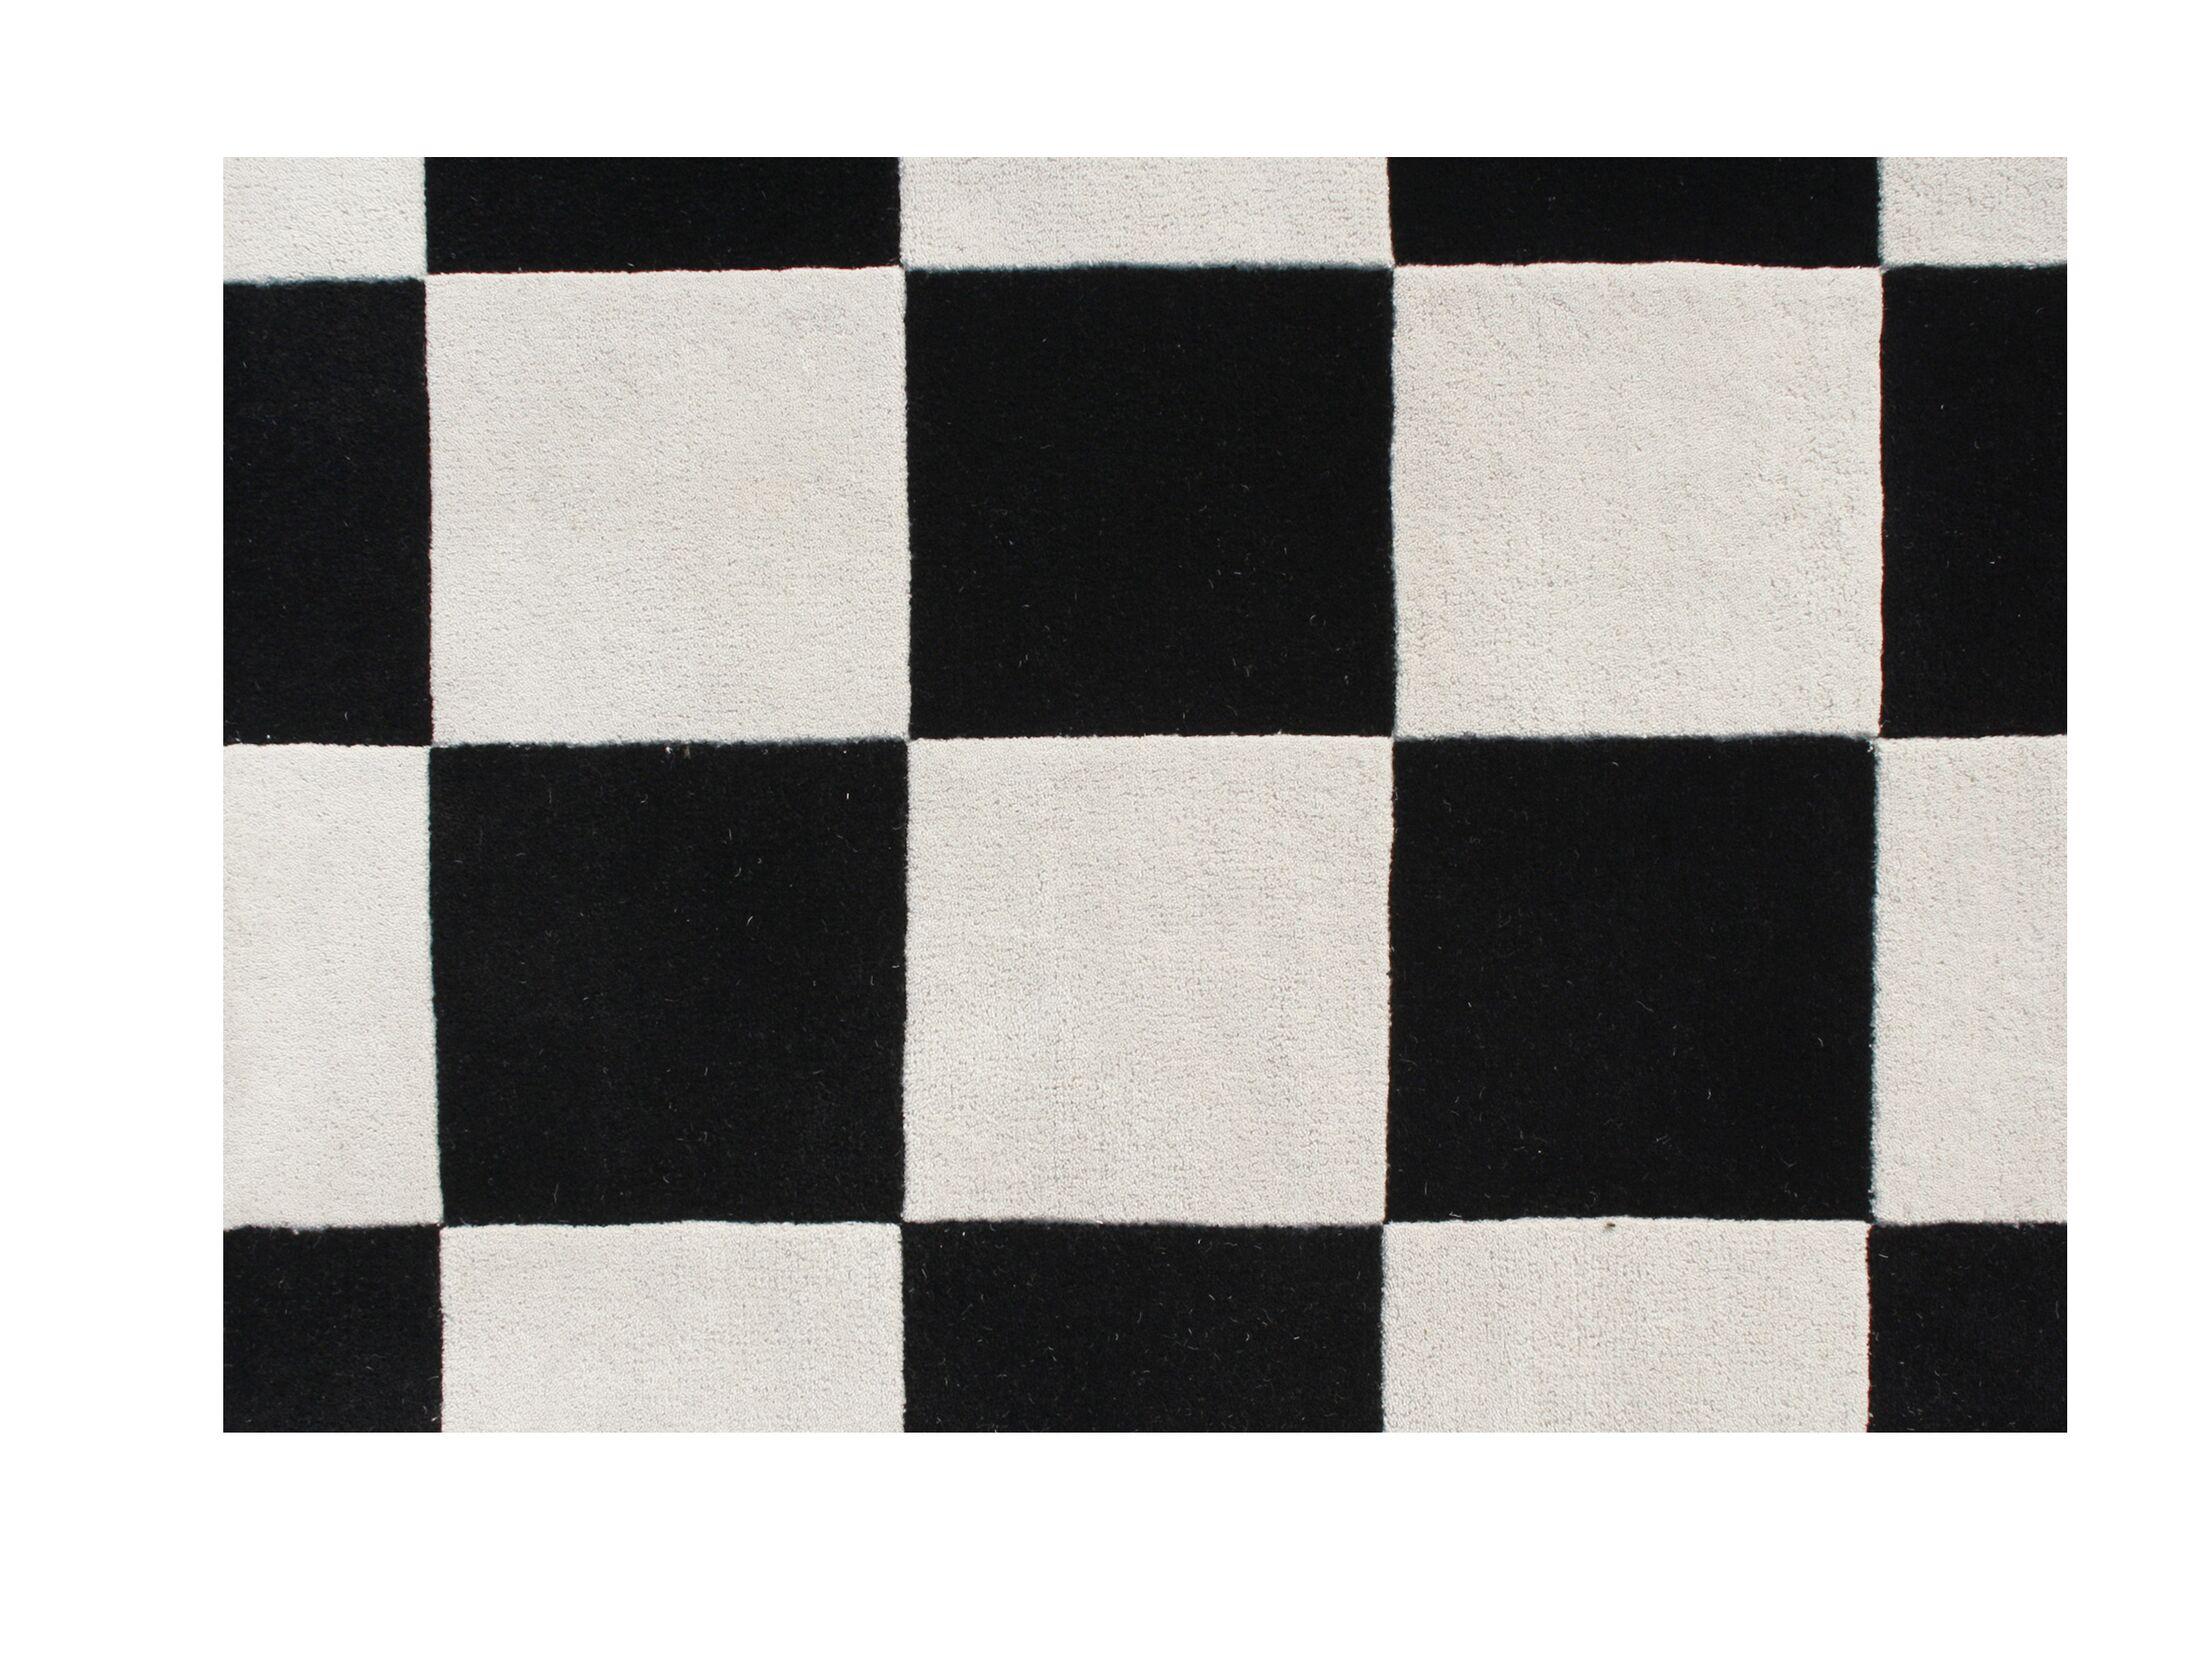 Pocahontas Hand-Tufted White/Black Area Rug